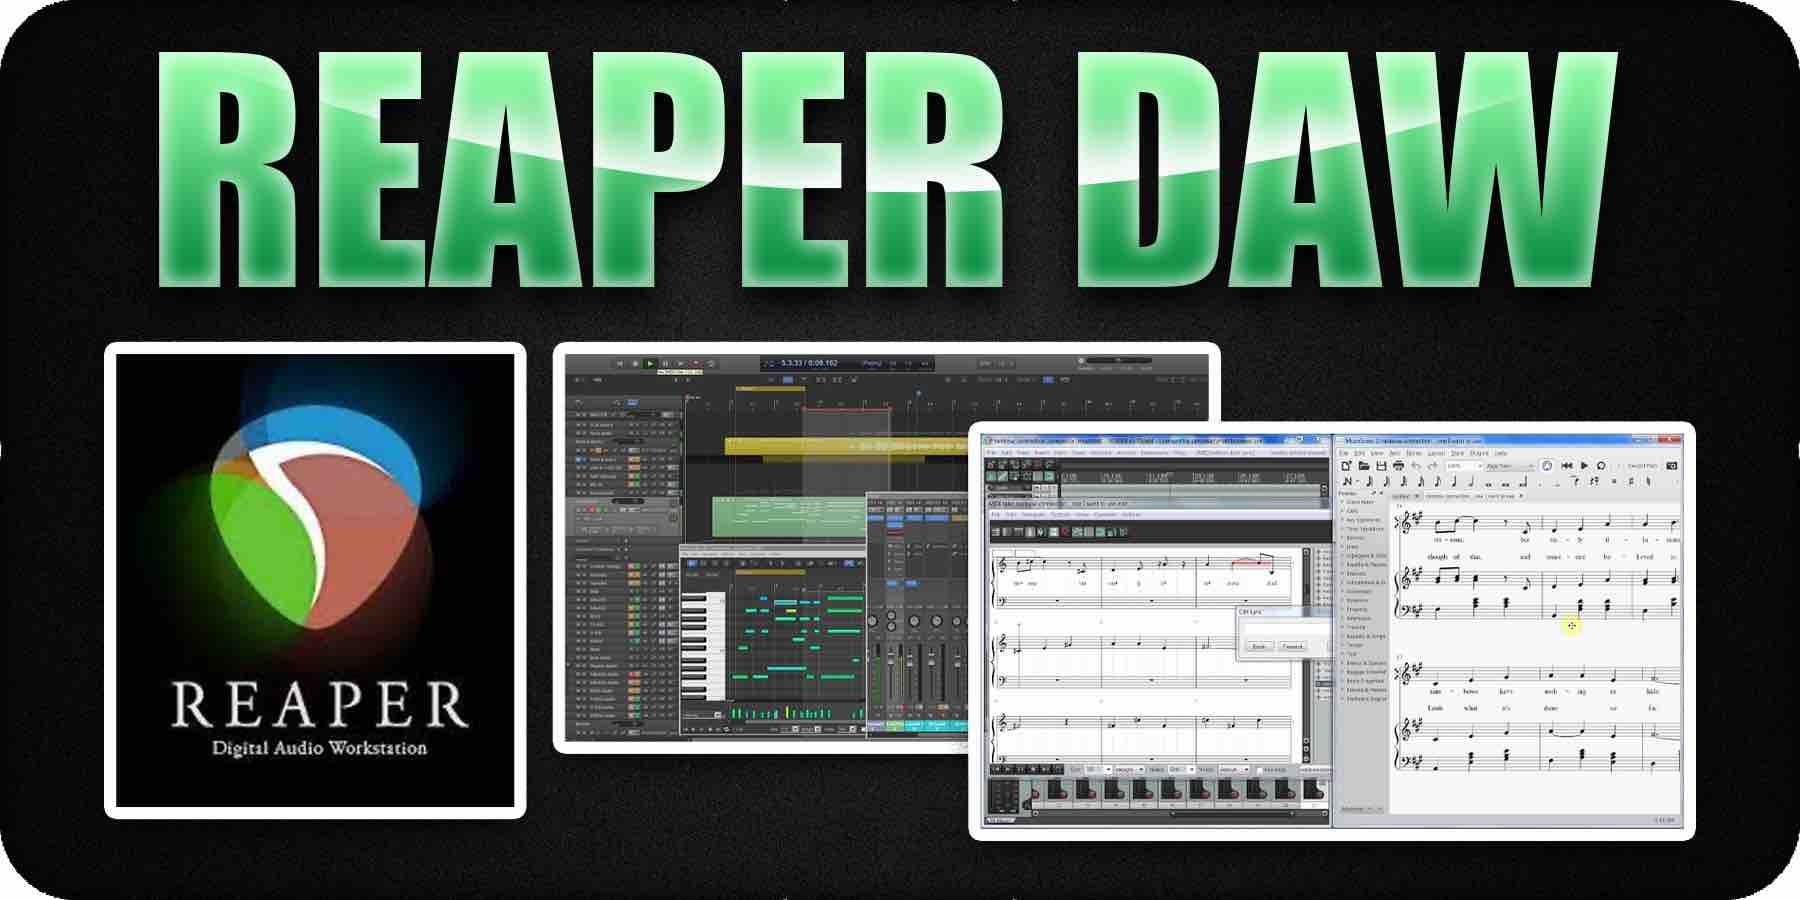 Reaper Daw music notation software